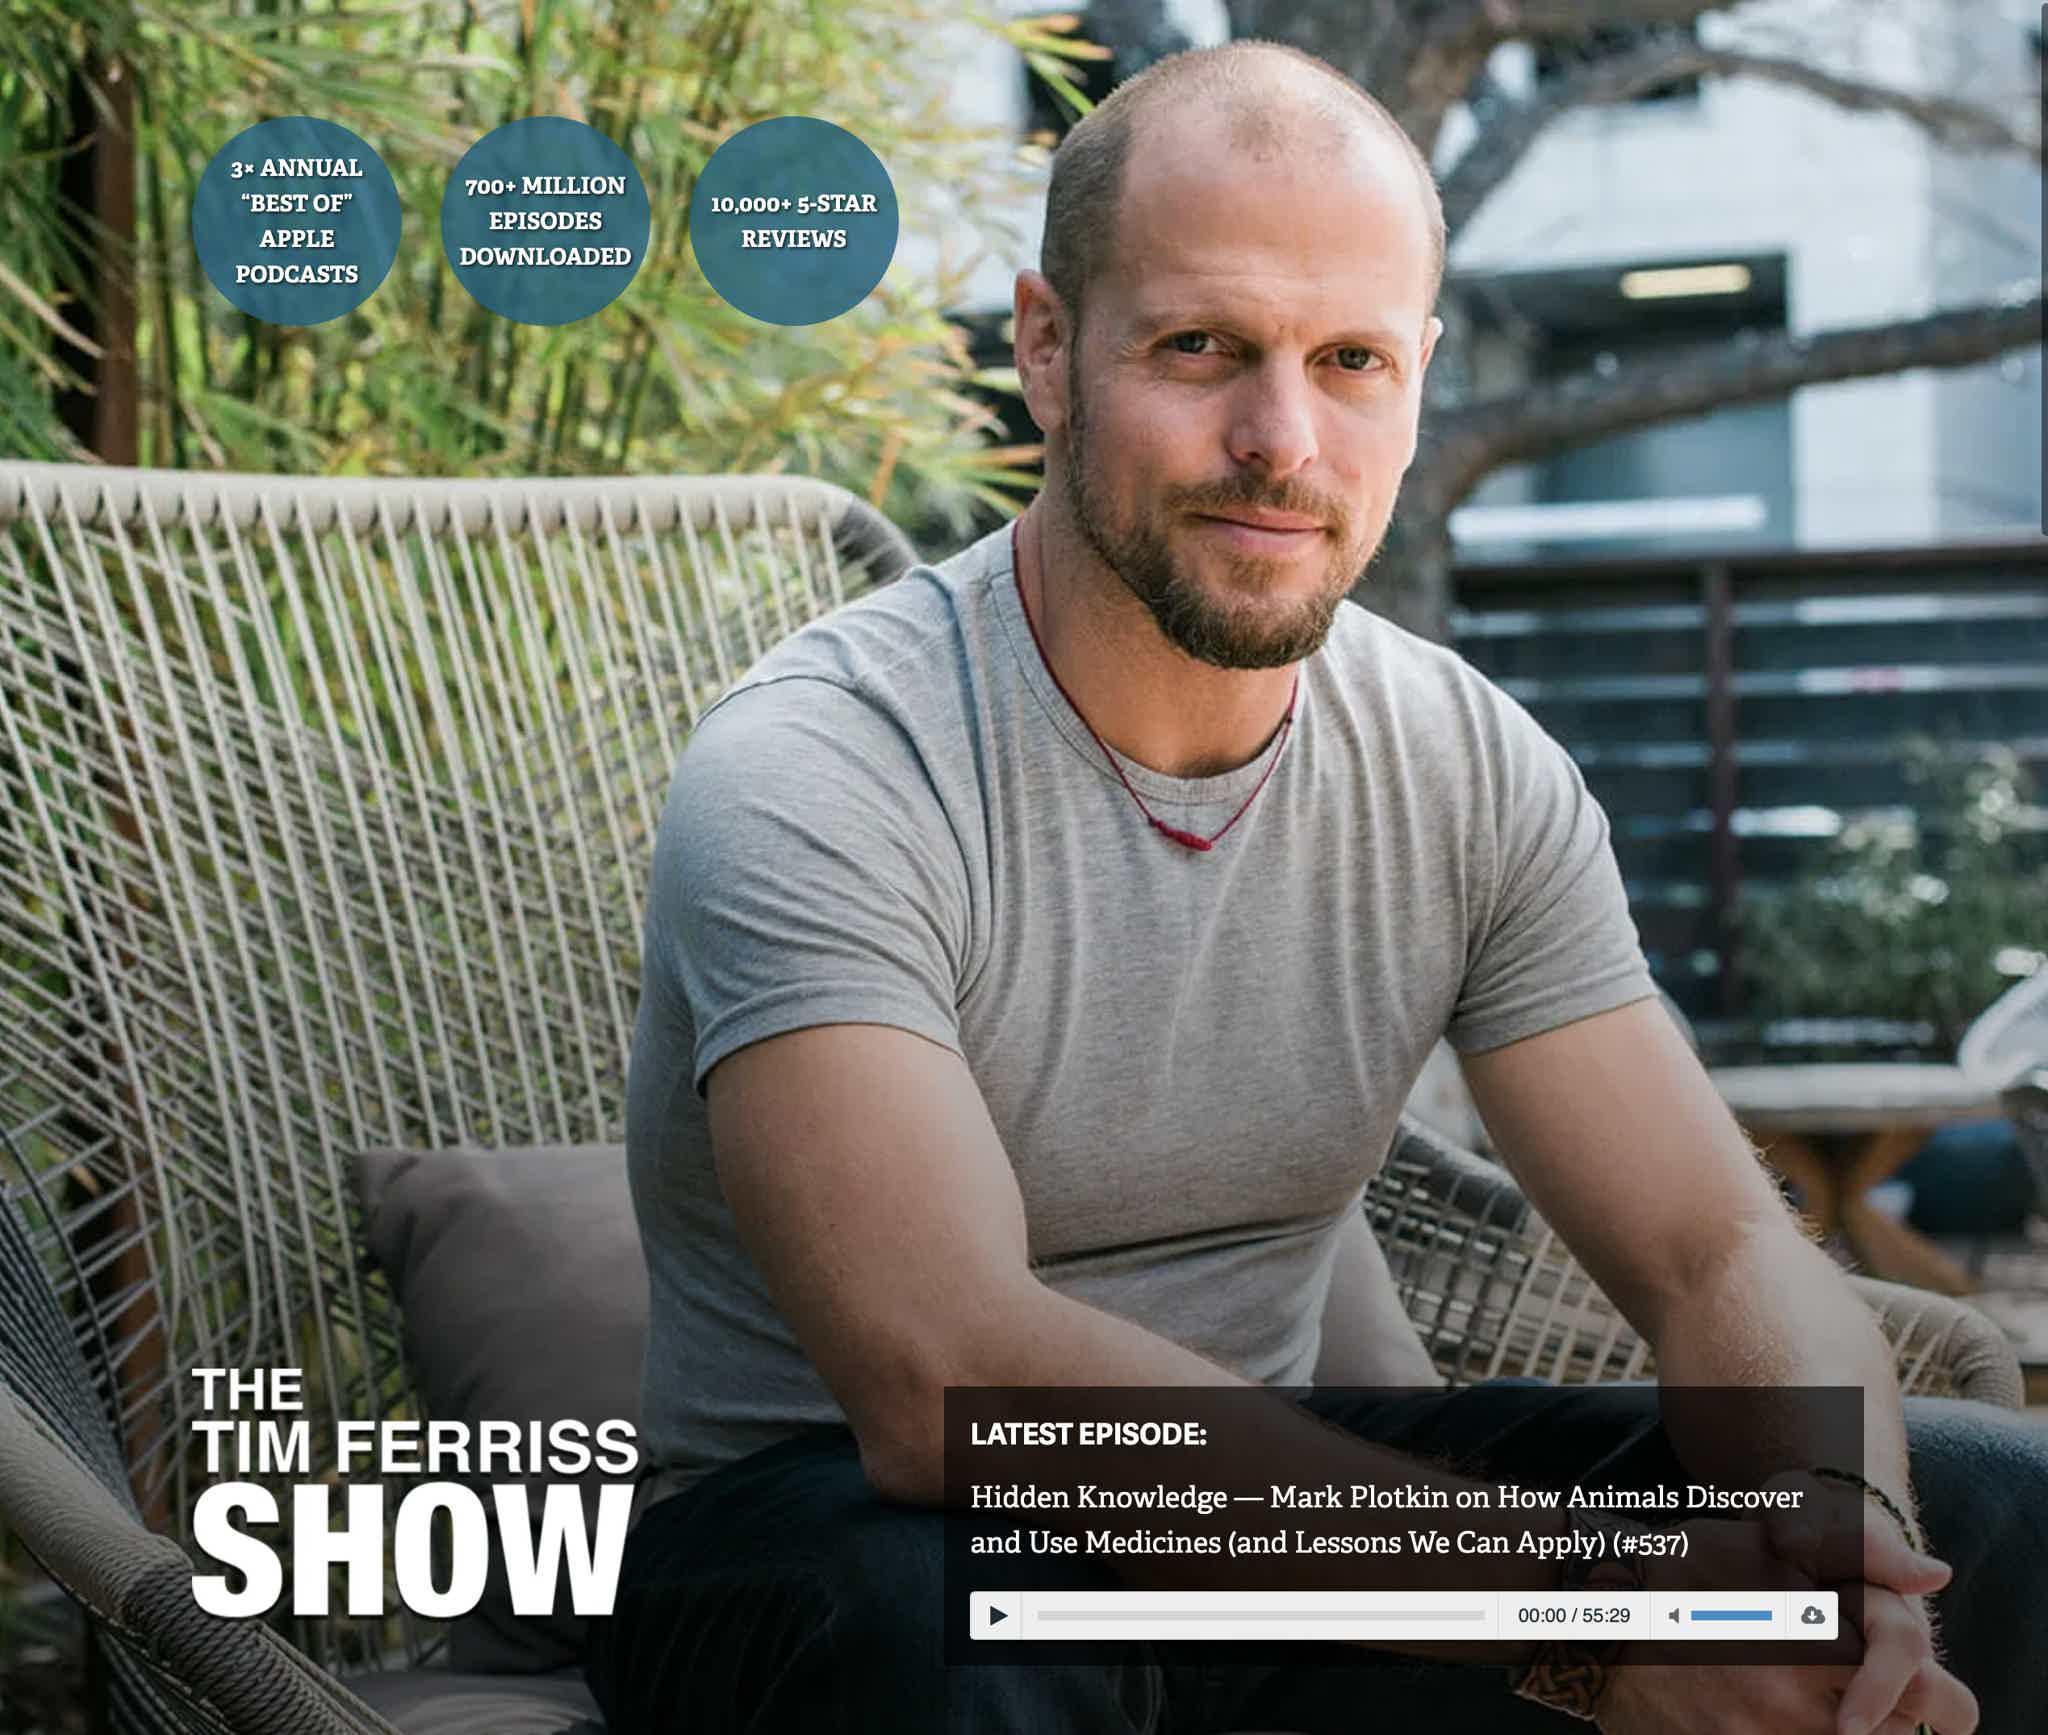 The Tim Ferriss Show